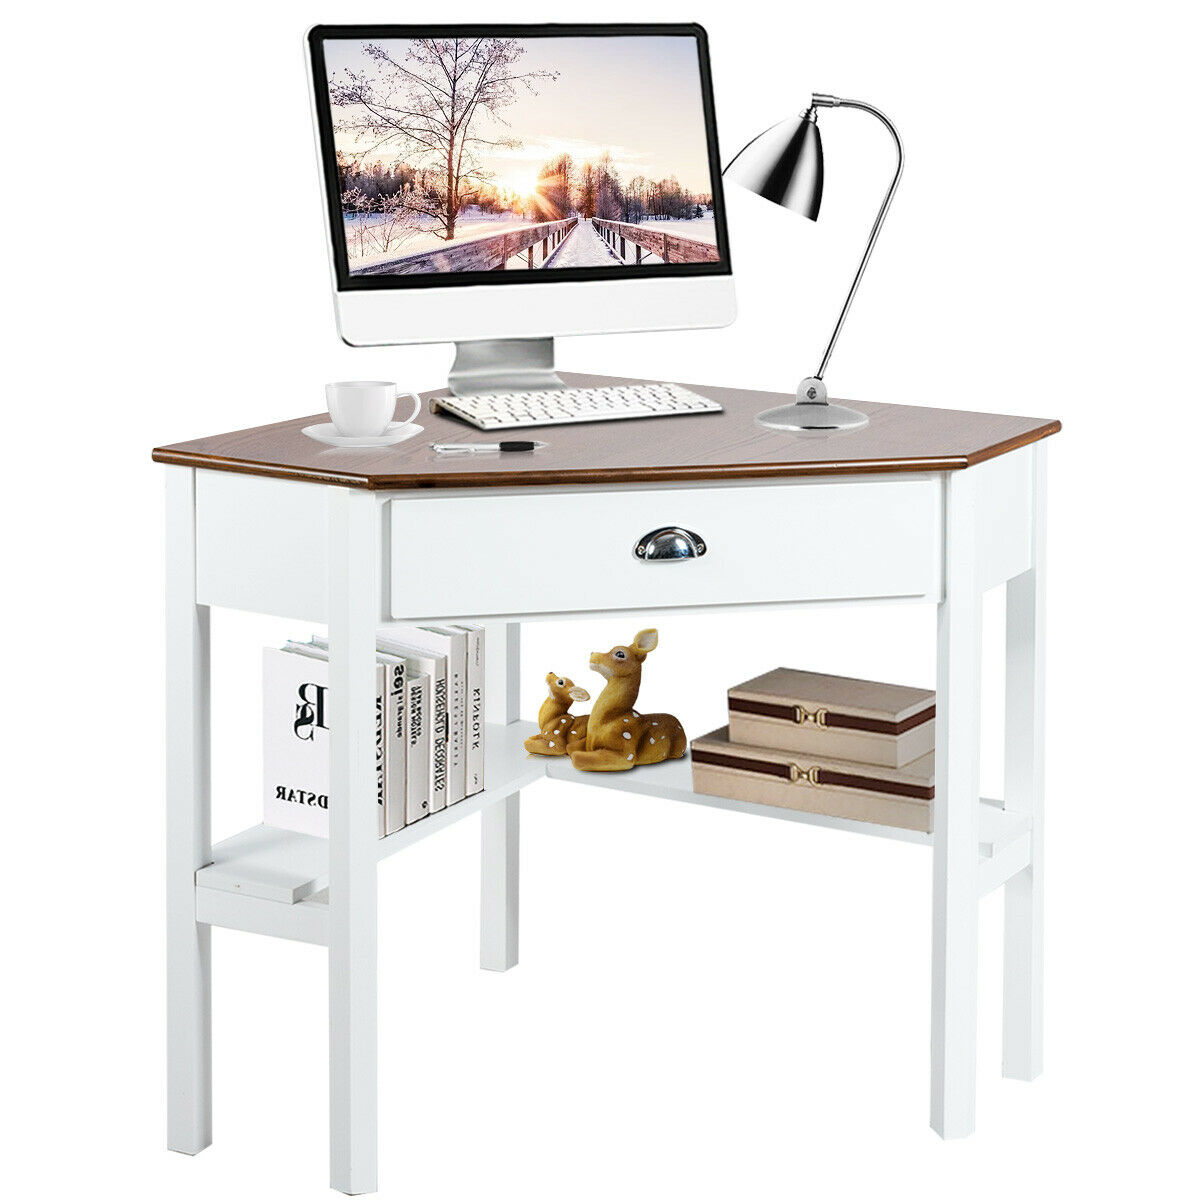 gymax corner computer desk laptop writing table workstation w drawer shelves natural